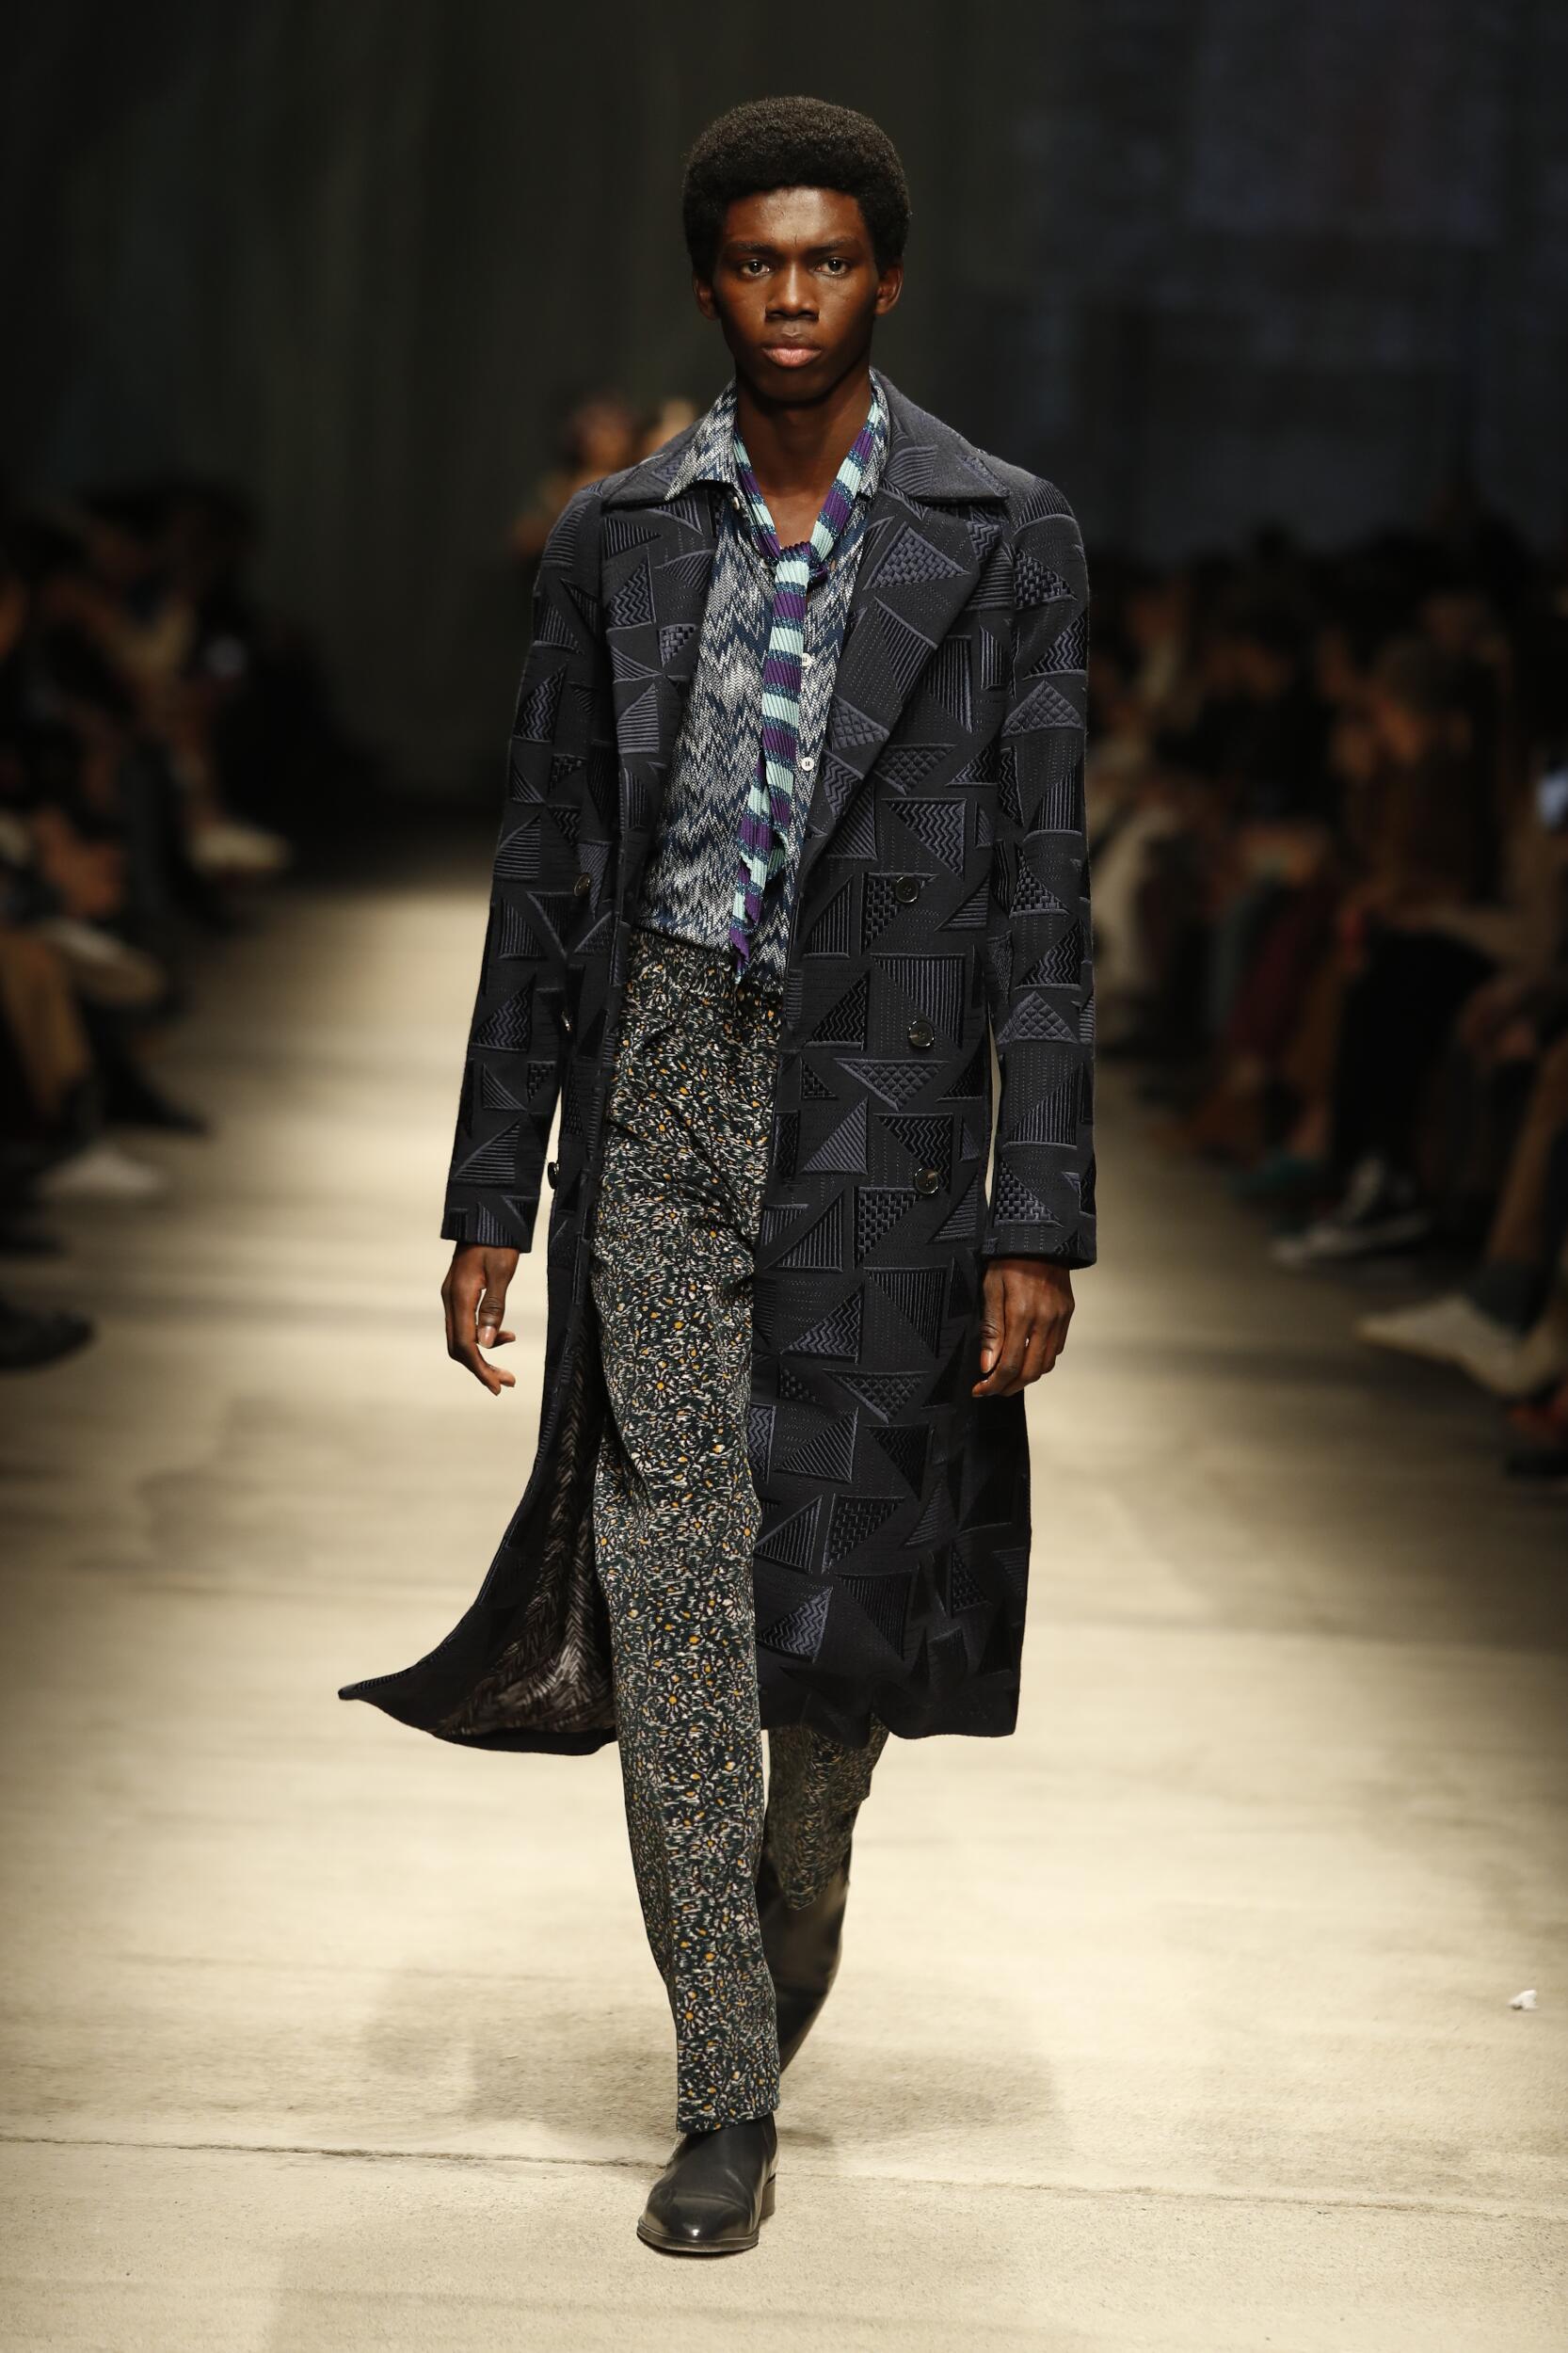 FW 2020-21 Missoni Fashion Show Milan Fashion Week